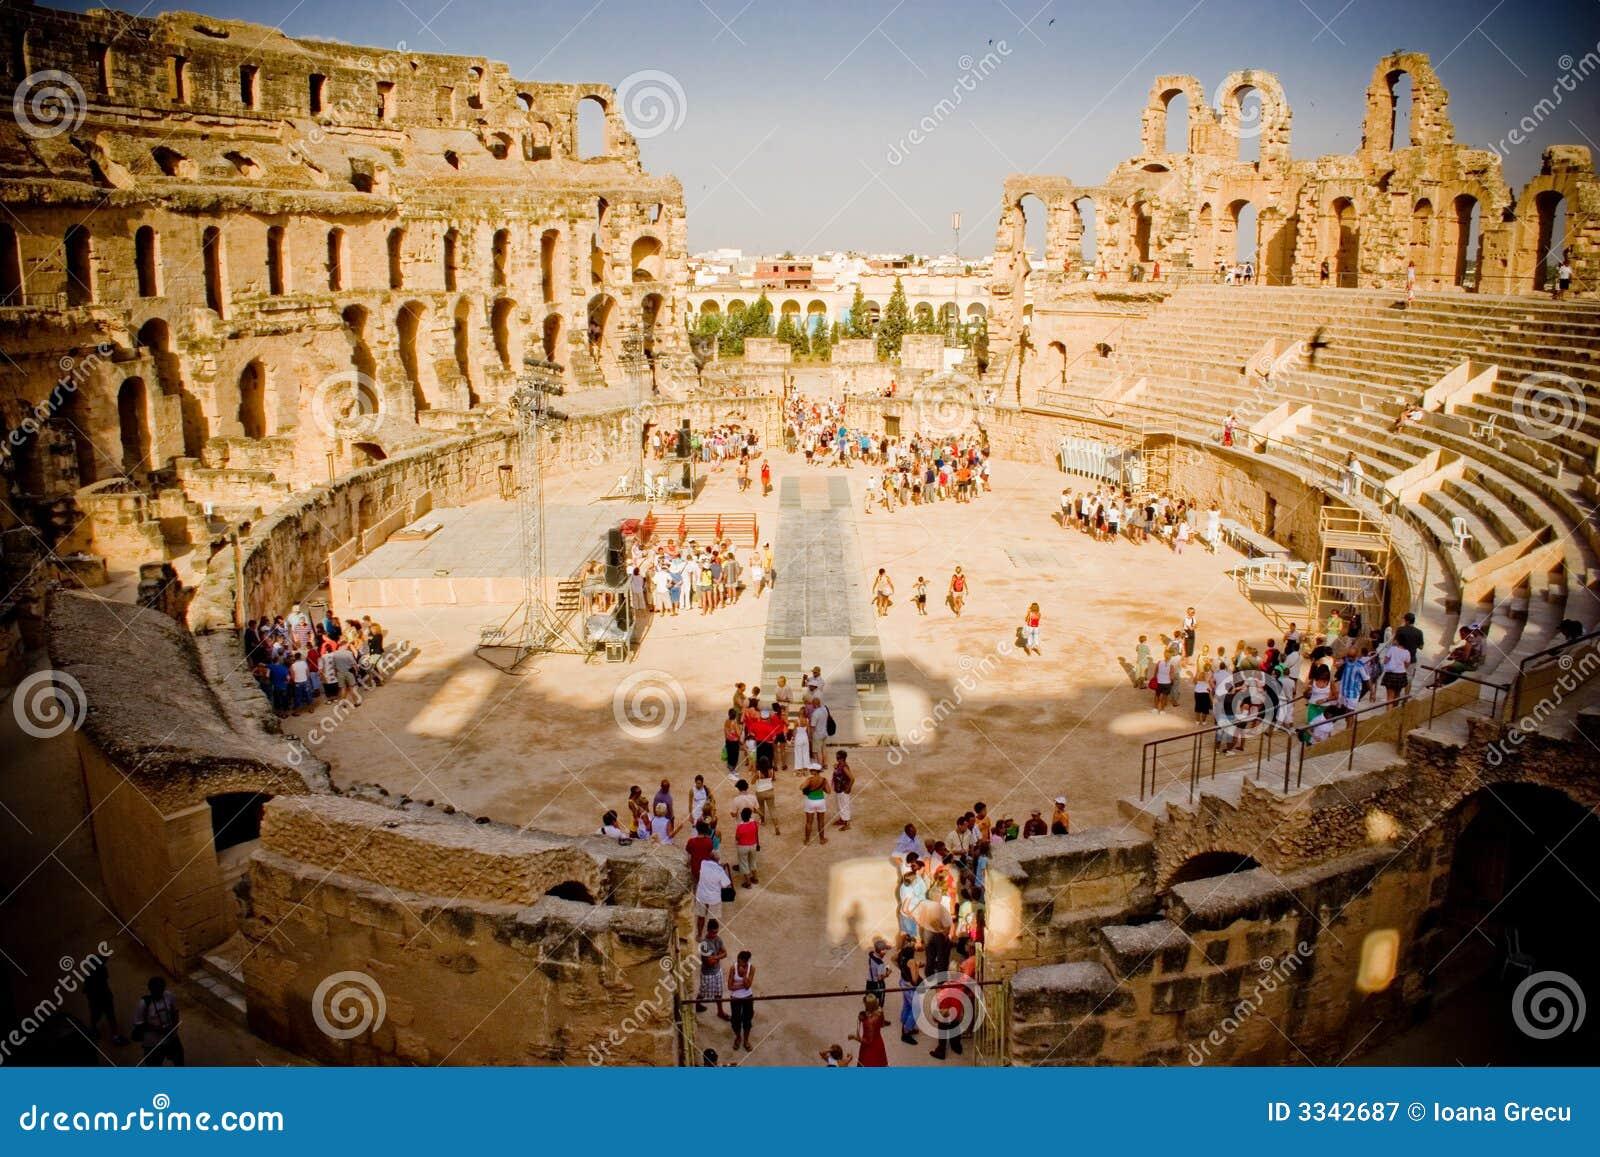 Colosseum, El Jem, Tunisia